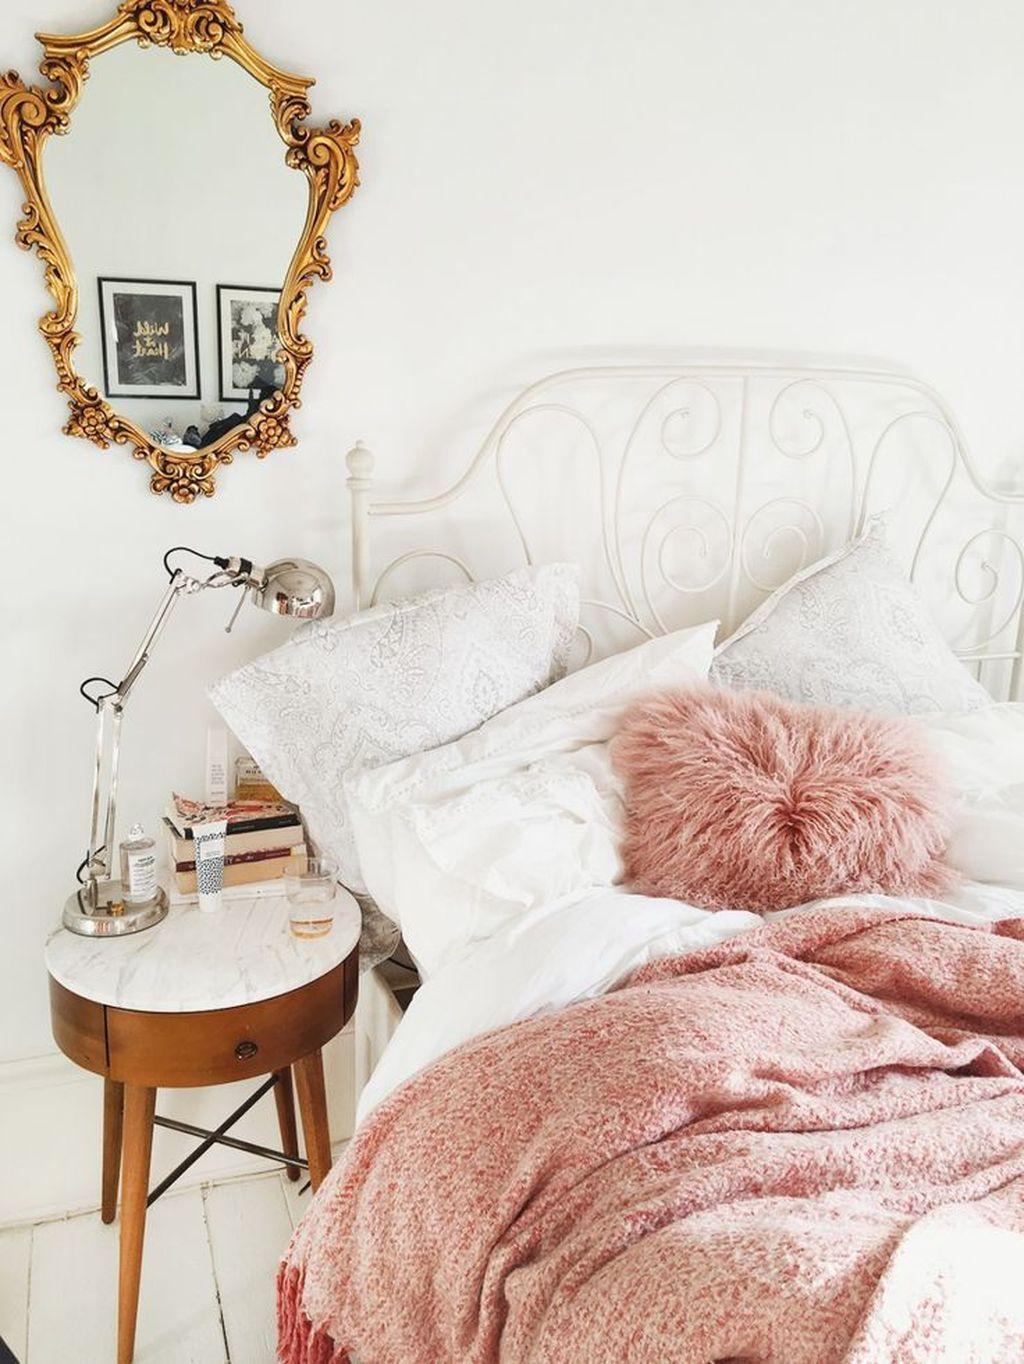 Cool 20 Stylish French Bedroom Decor